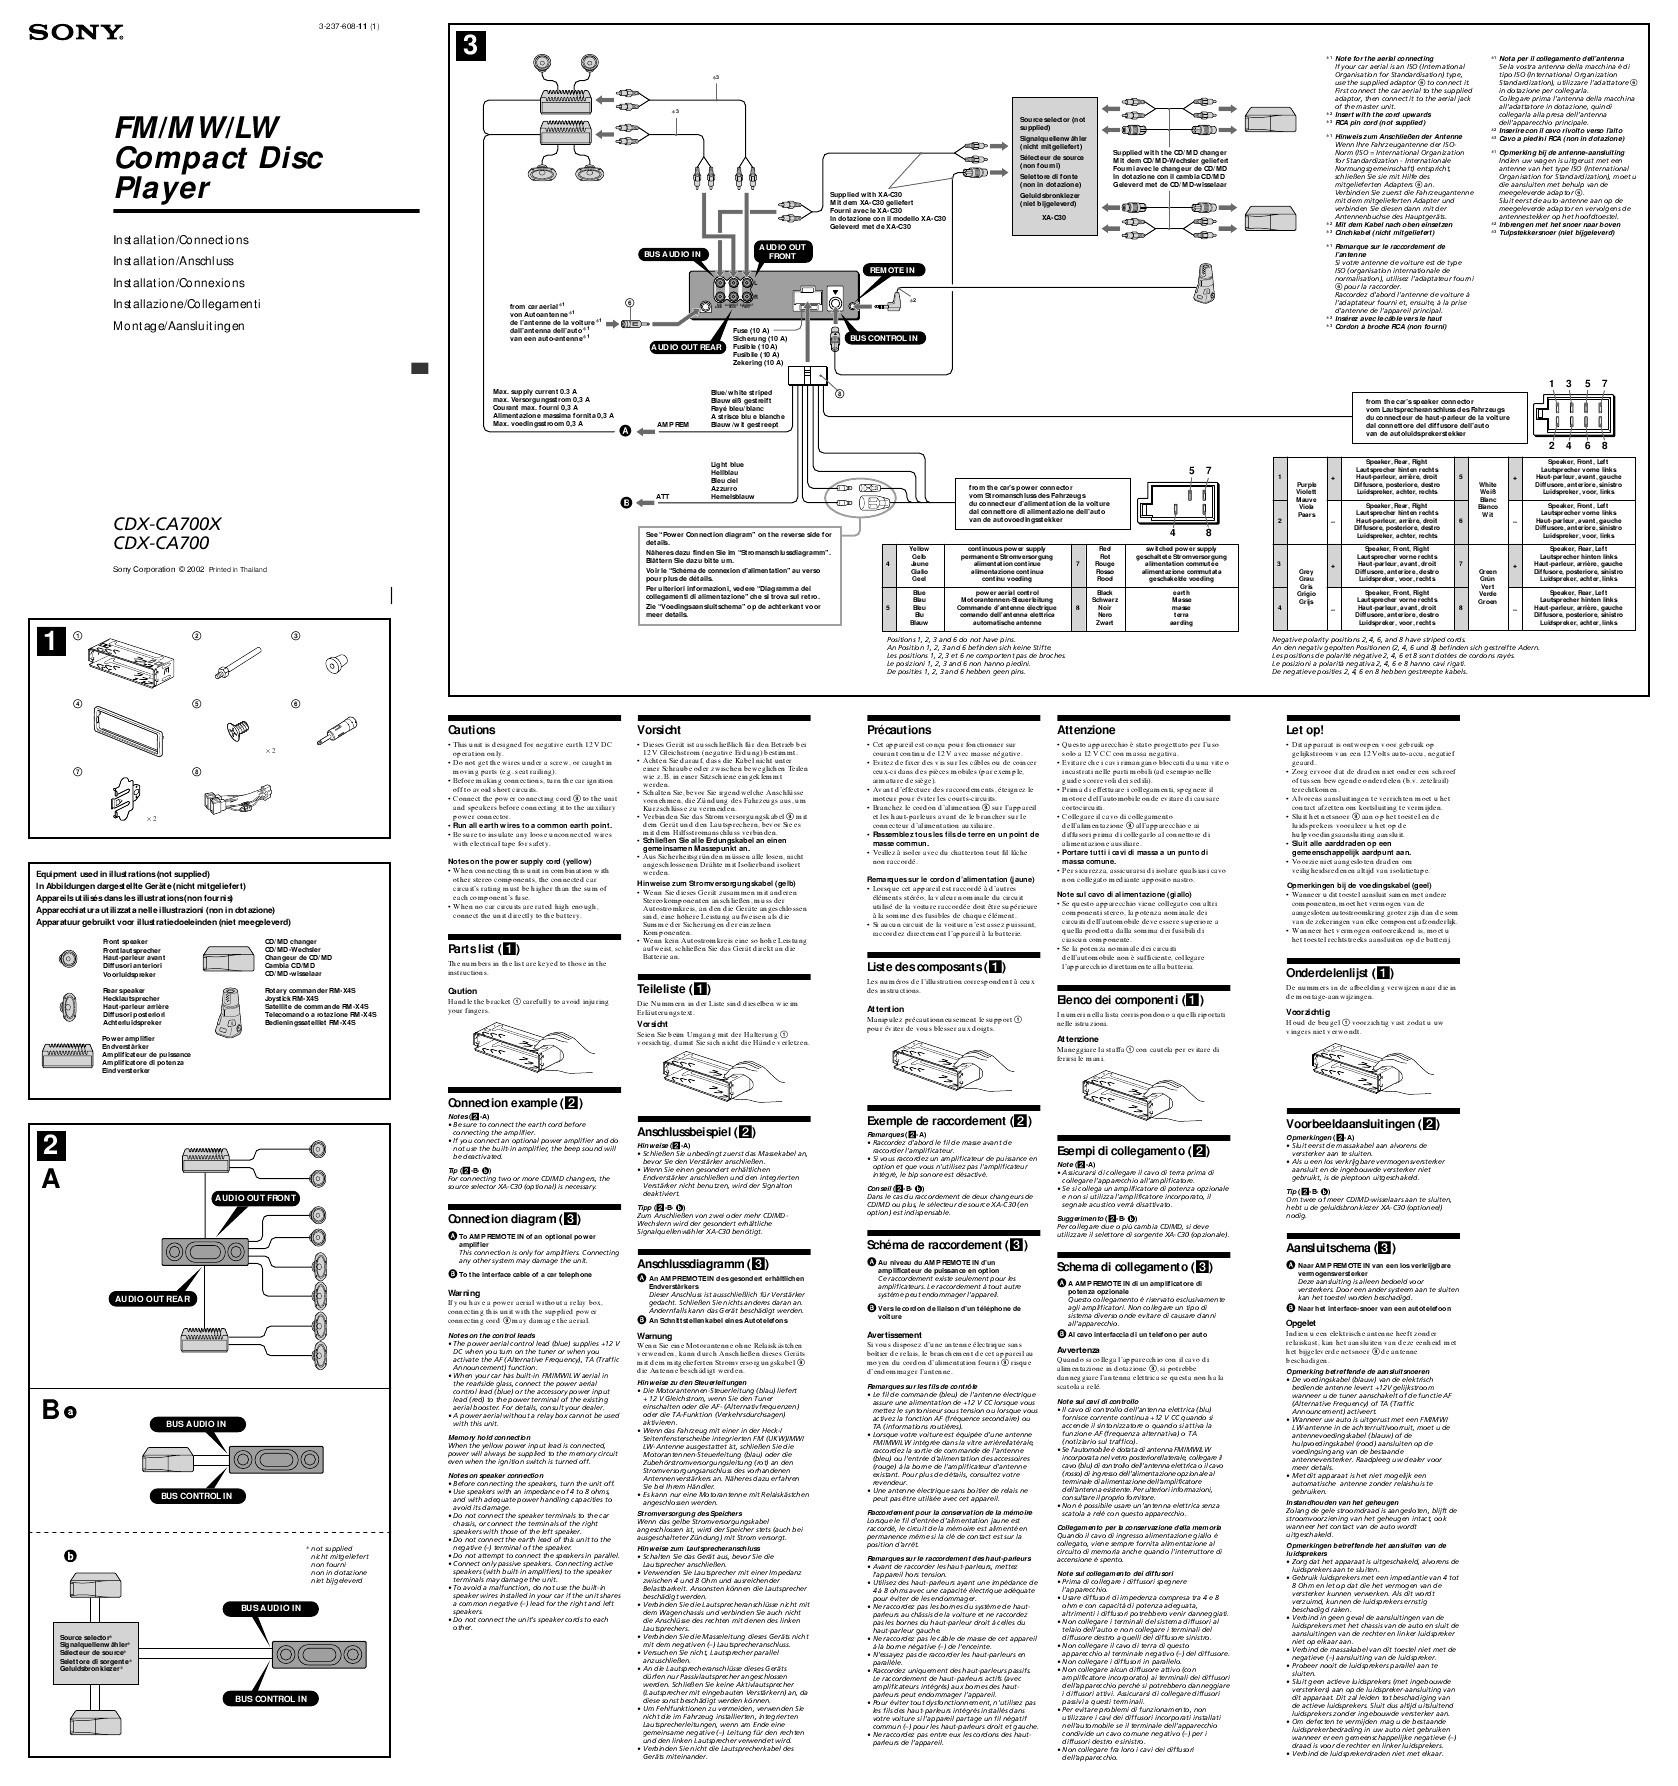 Sony Xplod Car Stereo Wiring Diagram Diagram sony Xplod 52wx4 Wiring Stunning Of Sony Xplod Car Stereo Wiring Diagram